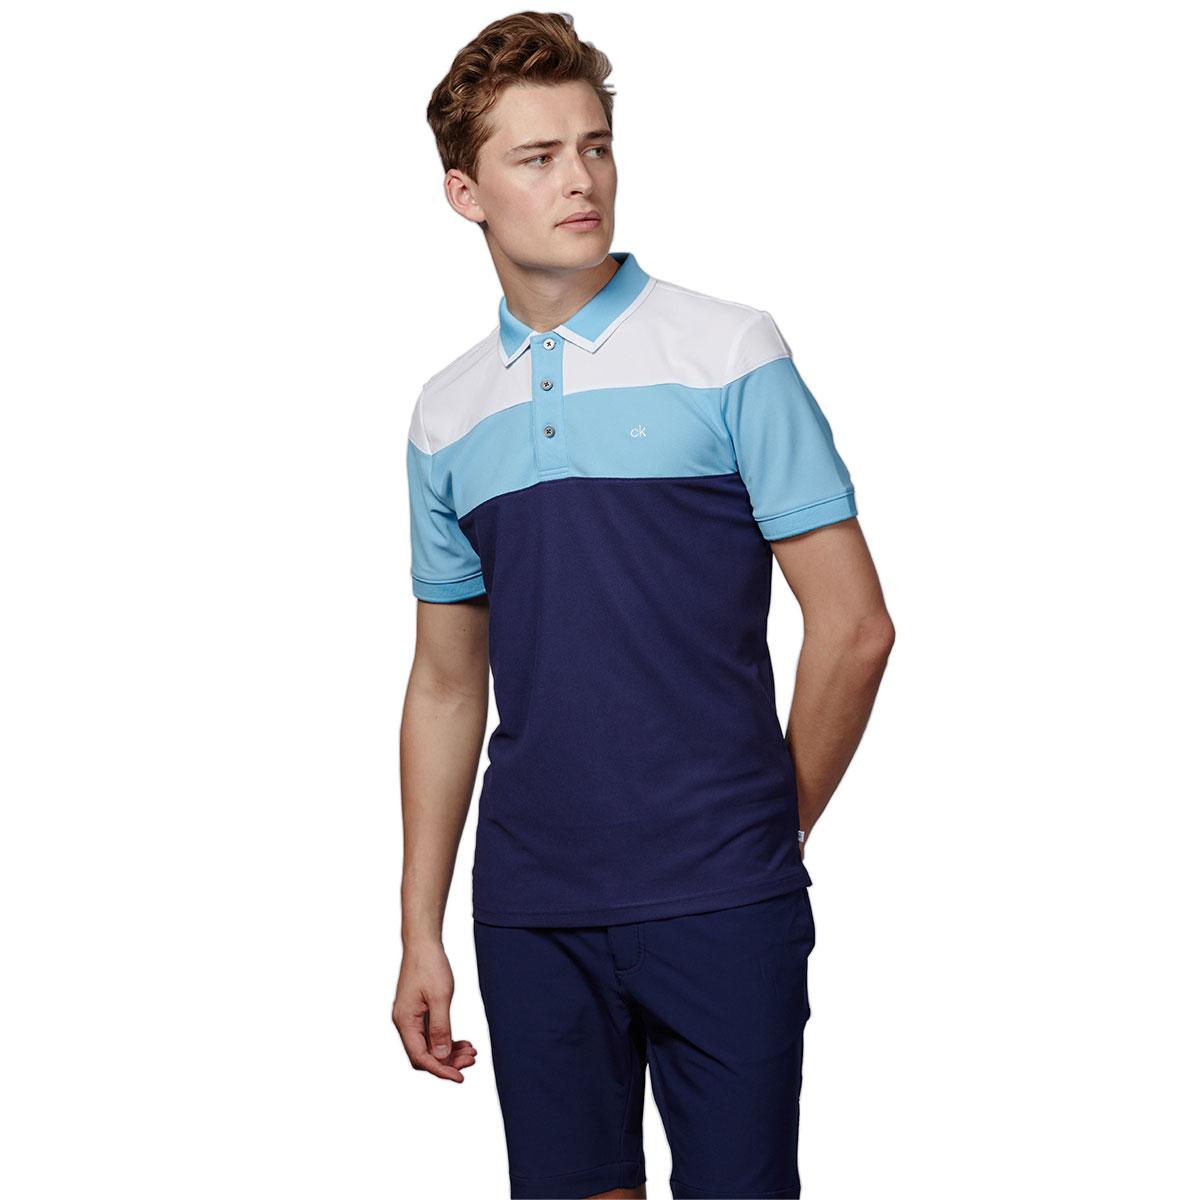 7dc52443 Calvin Klein Arinox Polo Shirt from american golf